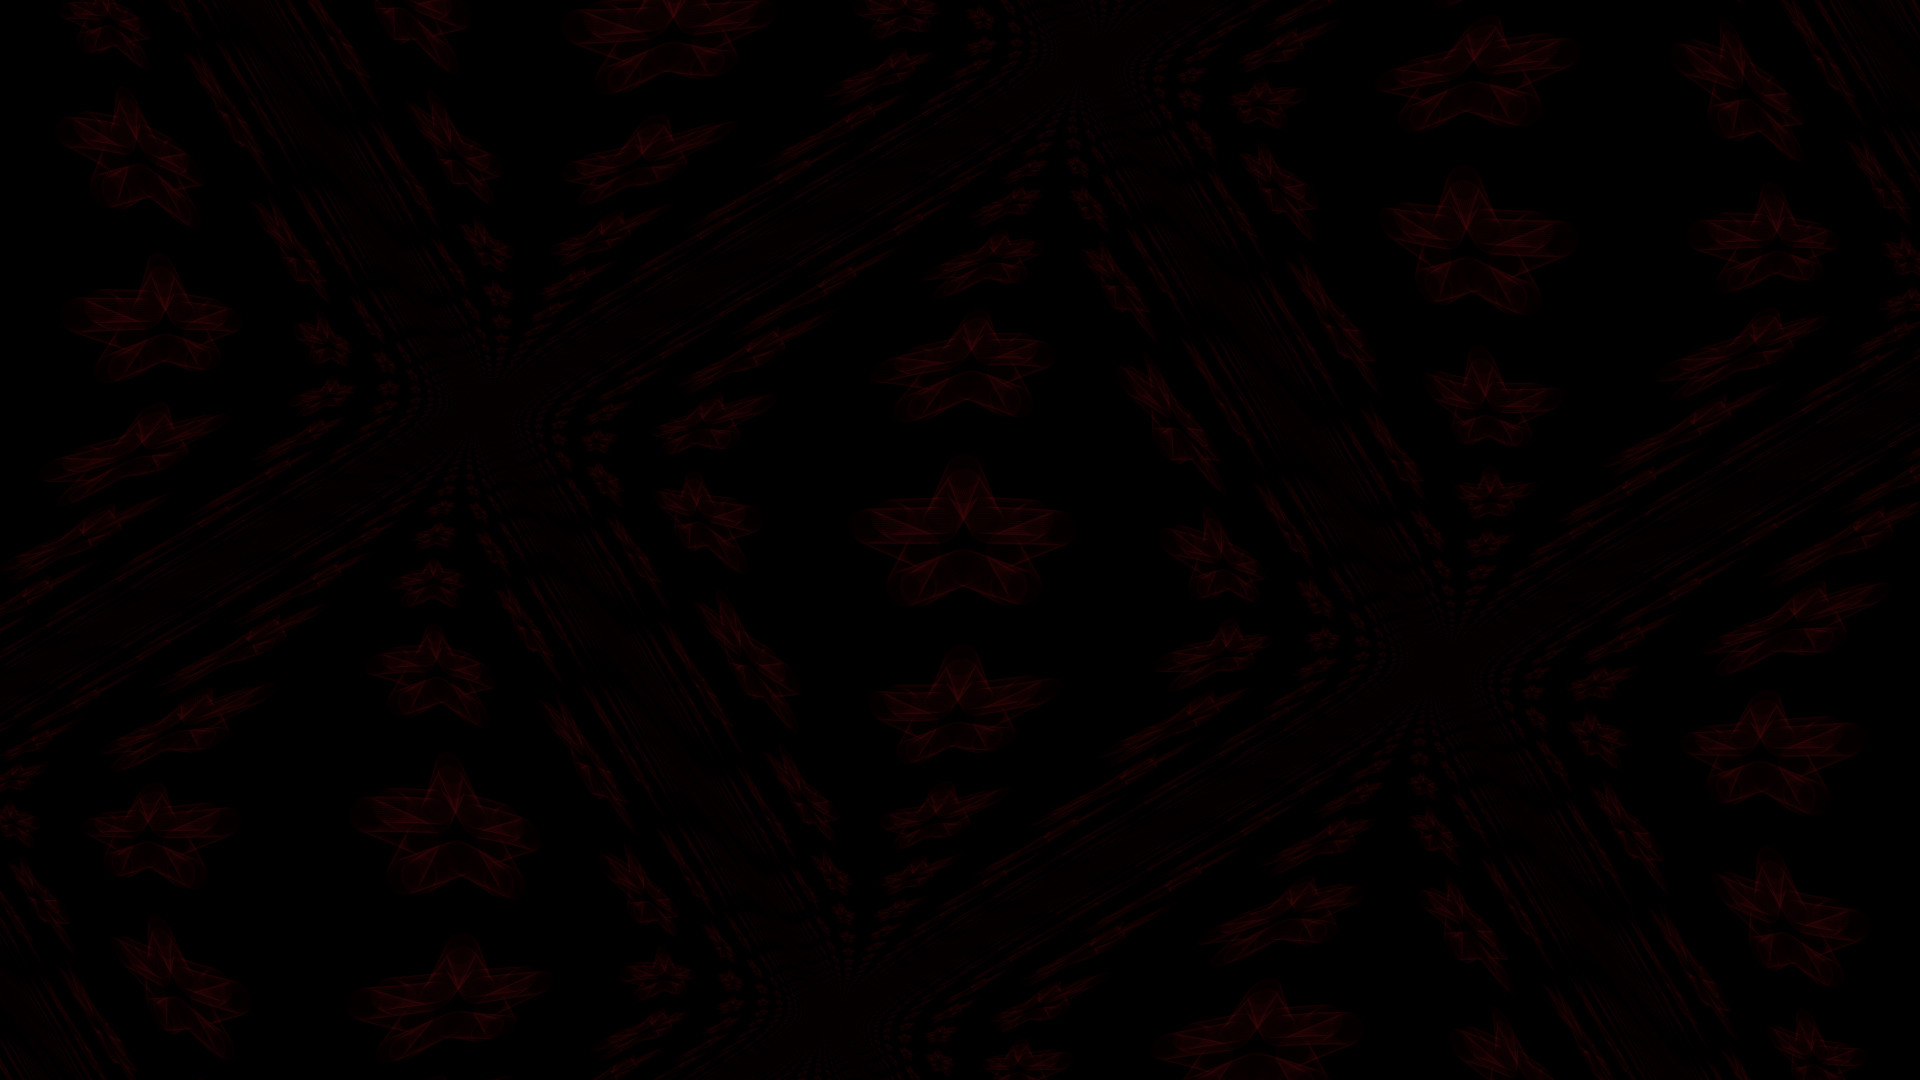 Black and Red wallpaper 1920x1080 by Eliittihemuli 1920x1080